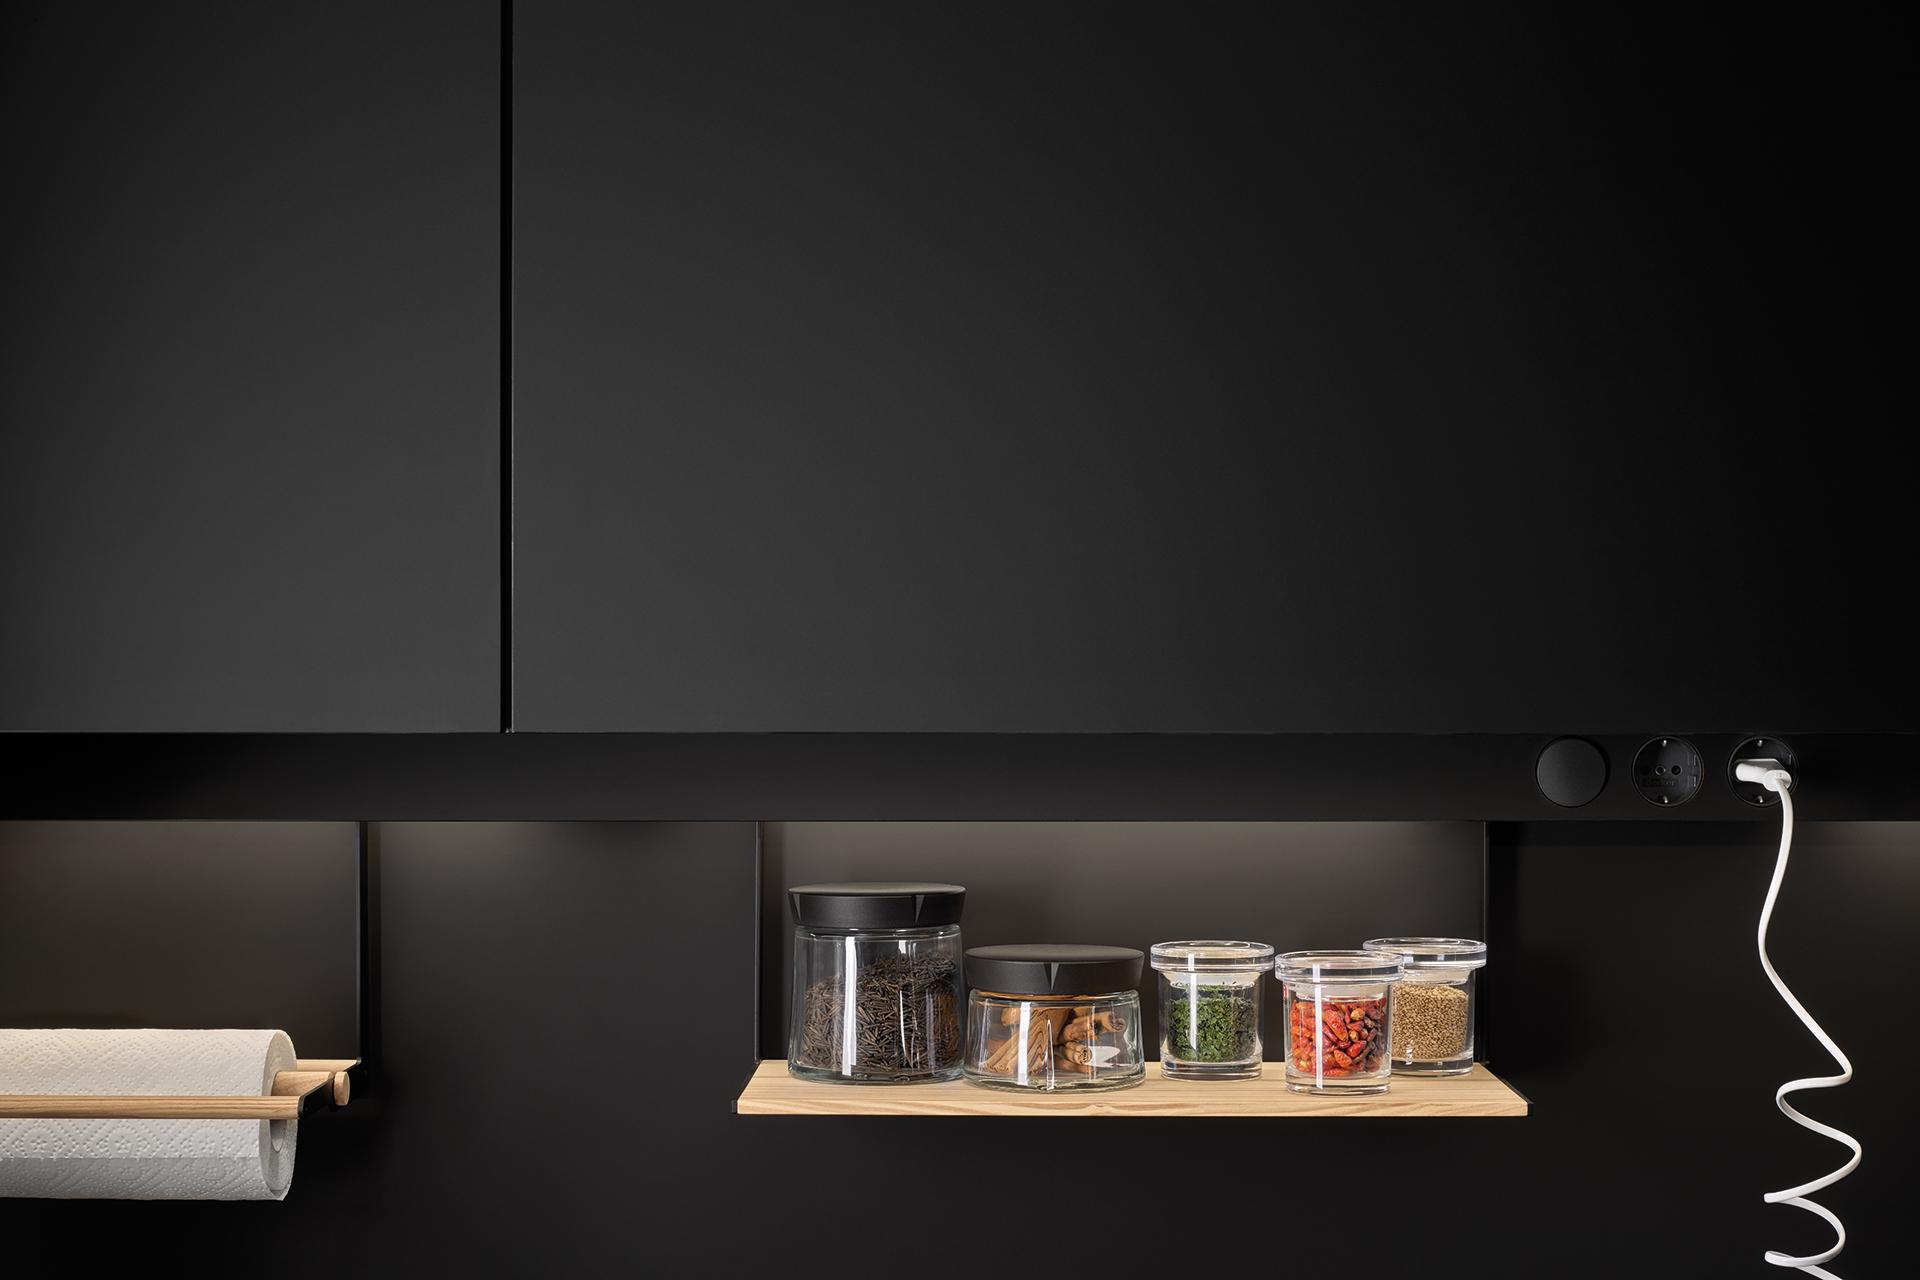 Keukens Santos afgewerkt met melamine of laminaat: variatie en weerstand